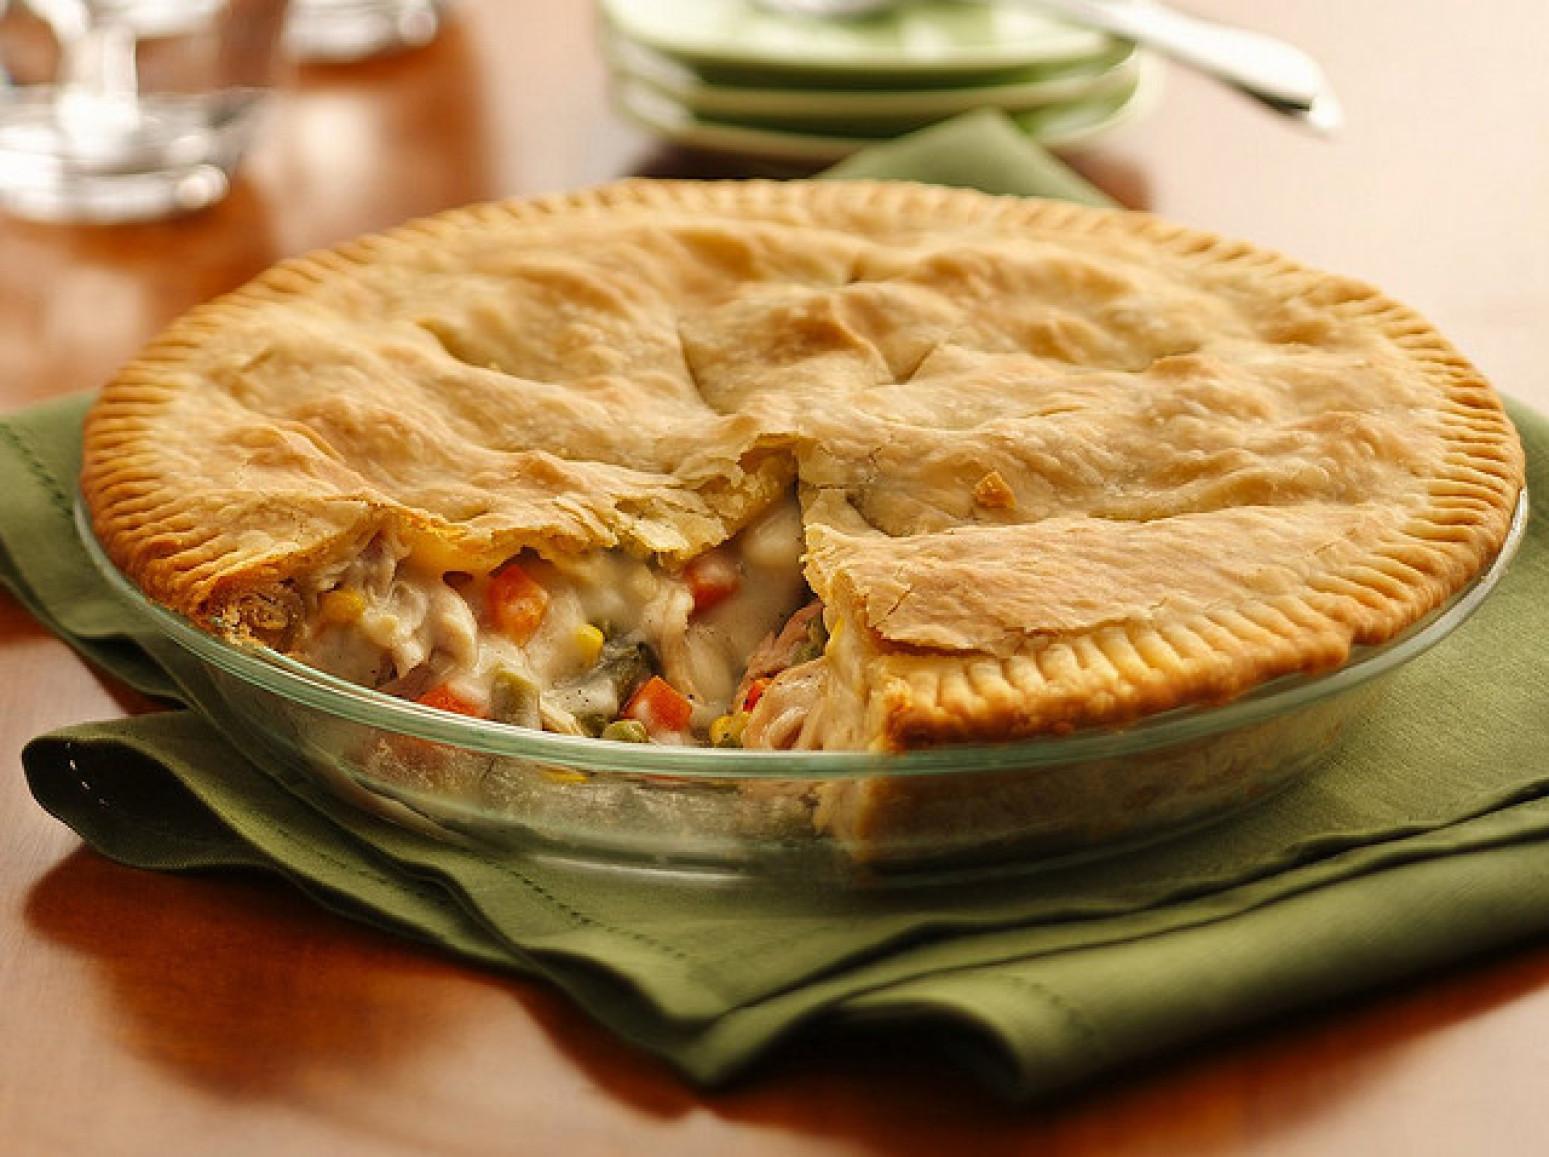 Classic Chicken Pot Pie Recipe 2 | Just A Pinch Recipes